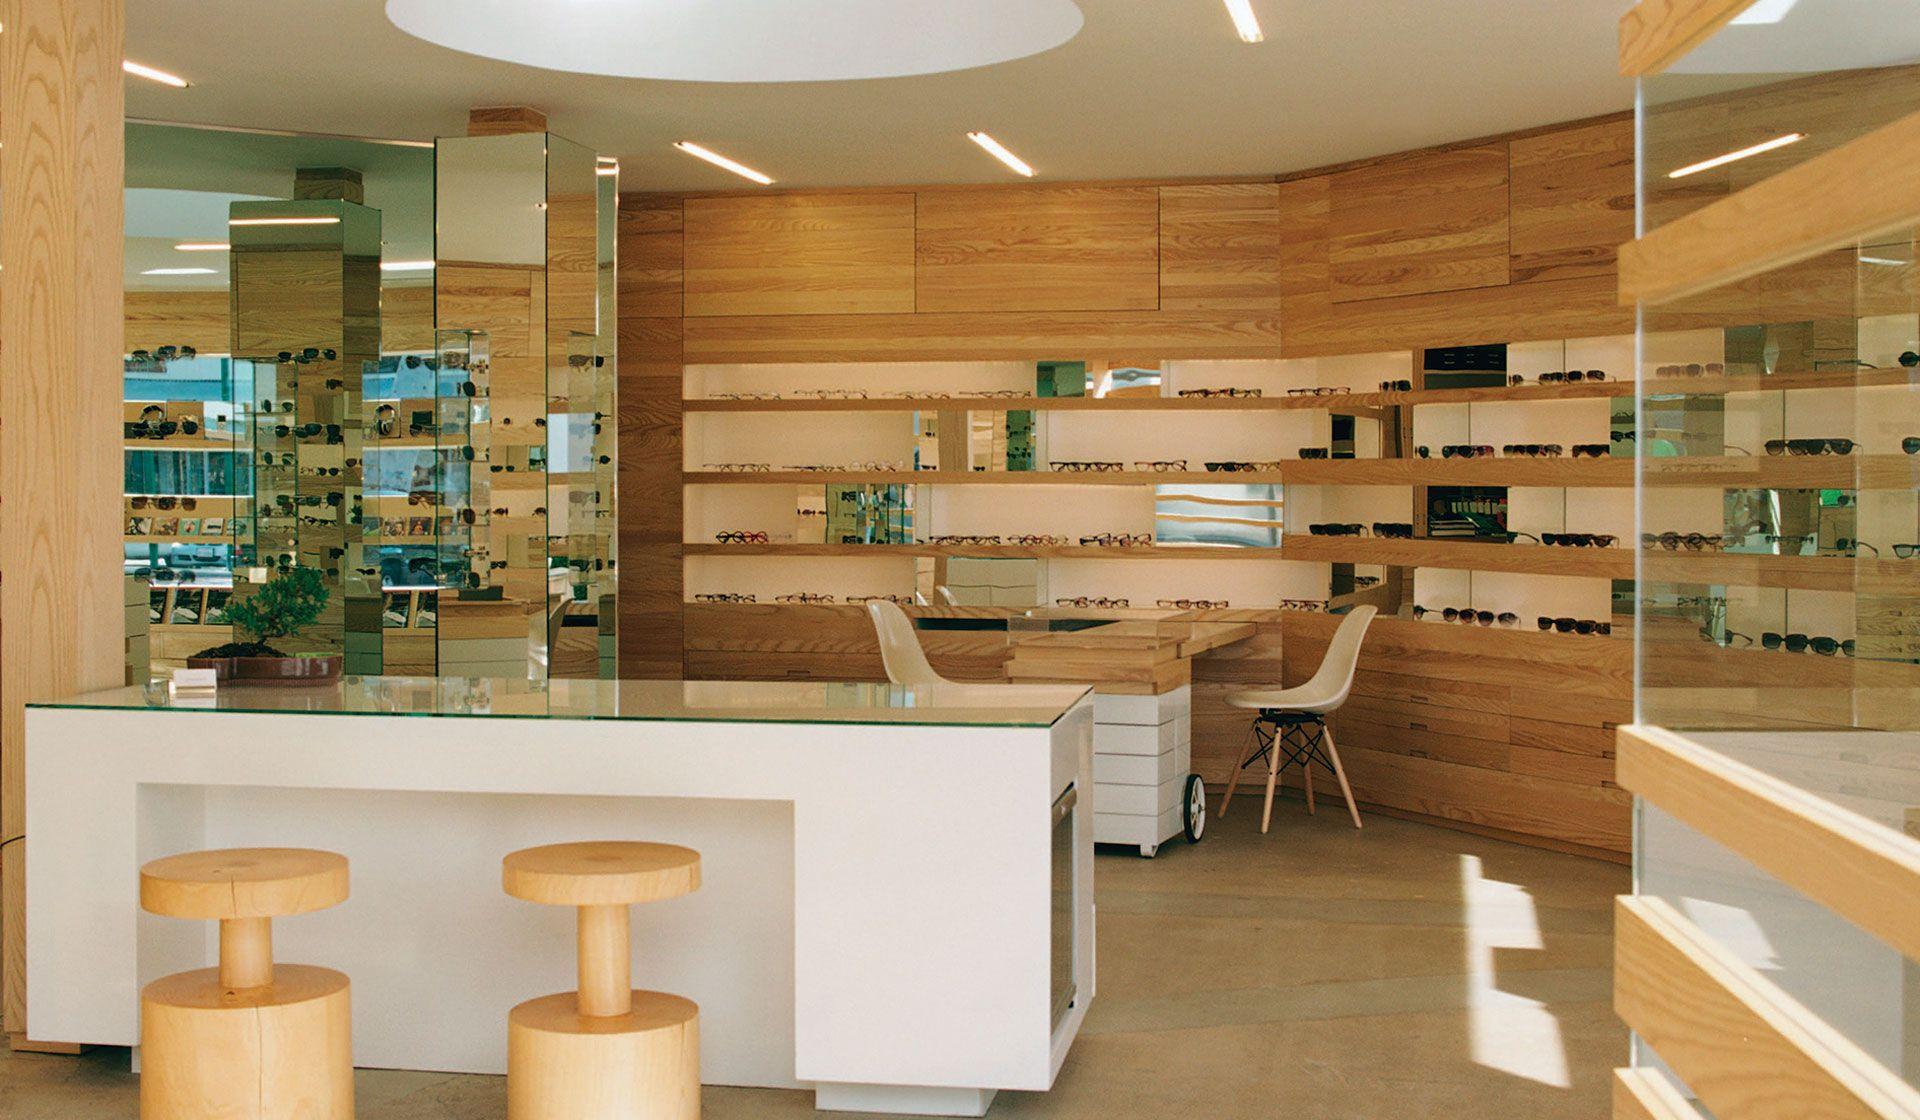 Oliver Peoples Malibu Sunglasses Boutique